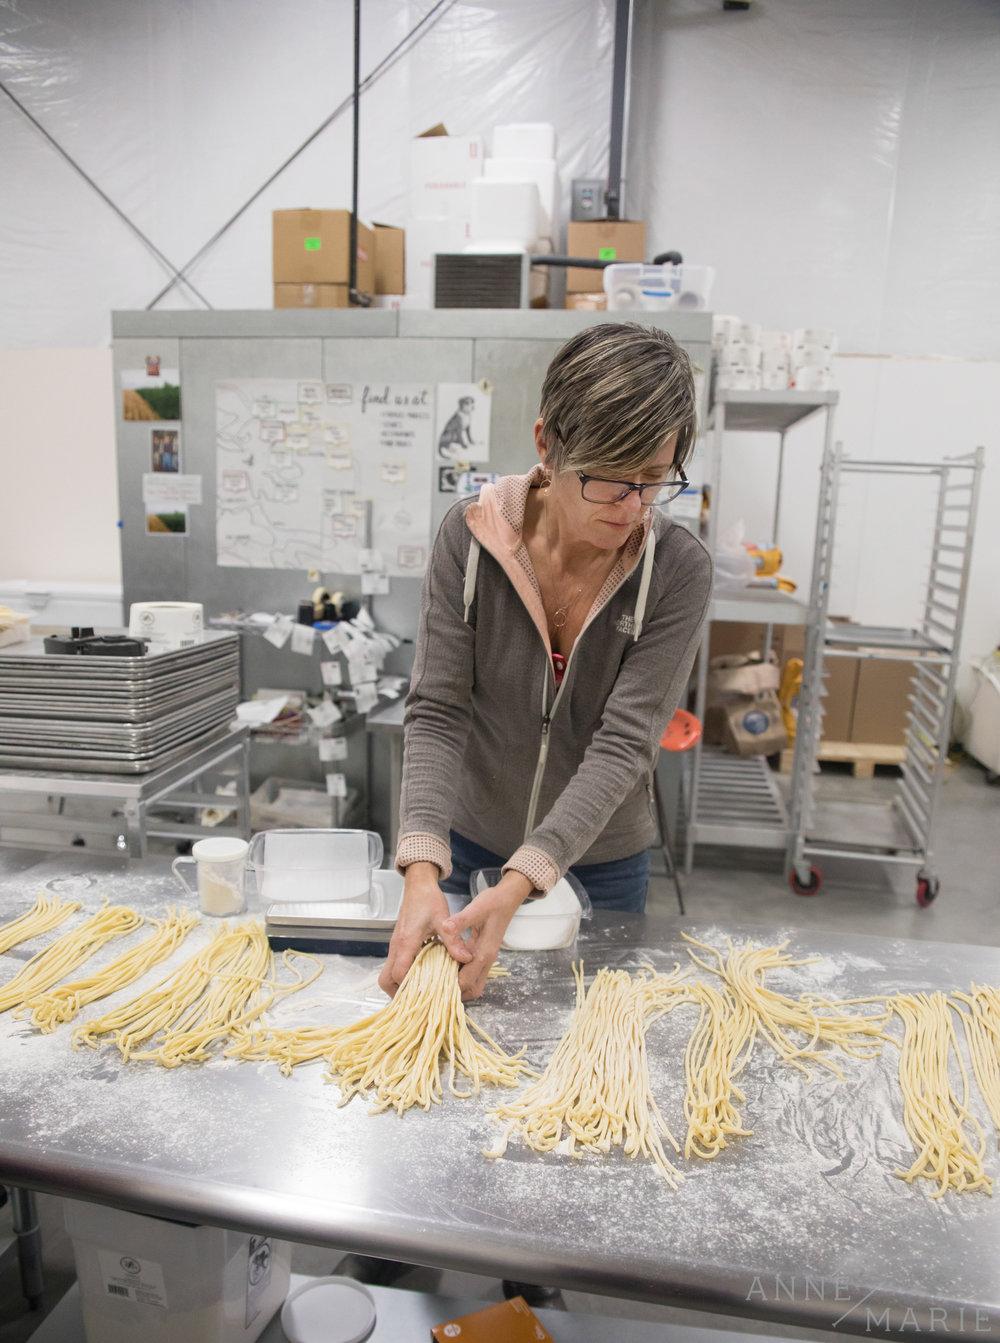 Katie sorts the pasta.